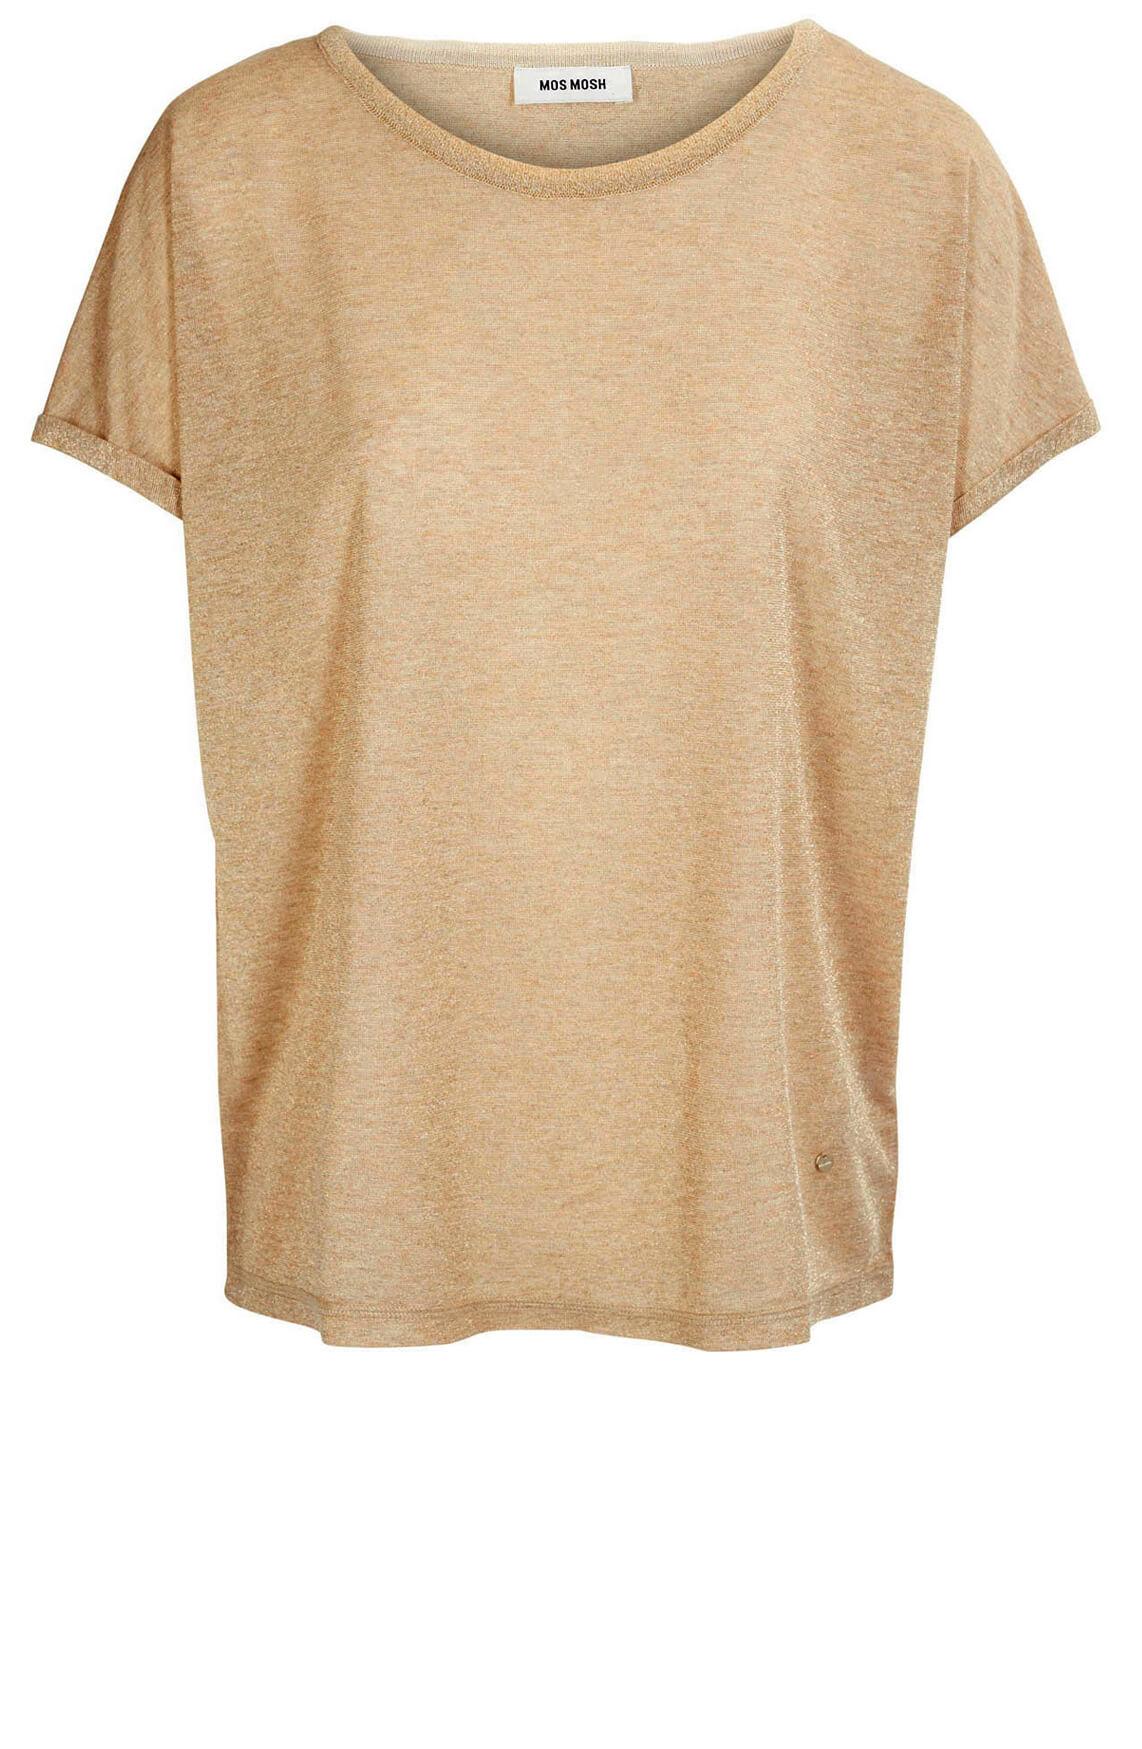 Mos Mosh Dames Kay glitter shirt goud